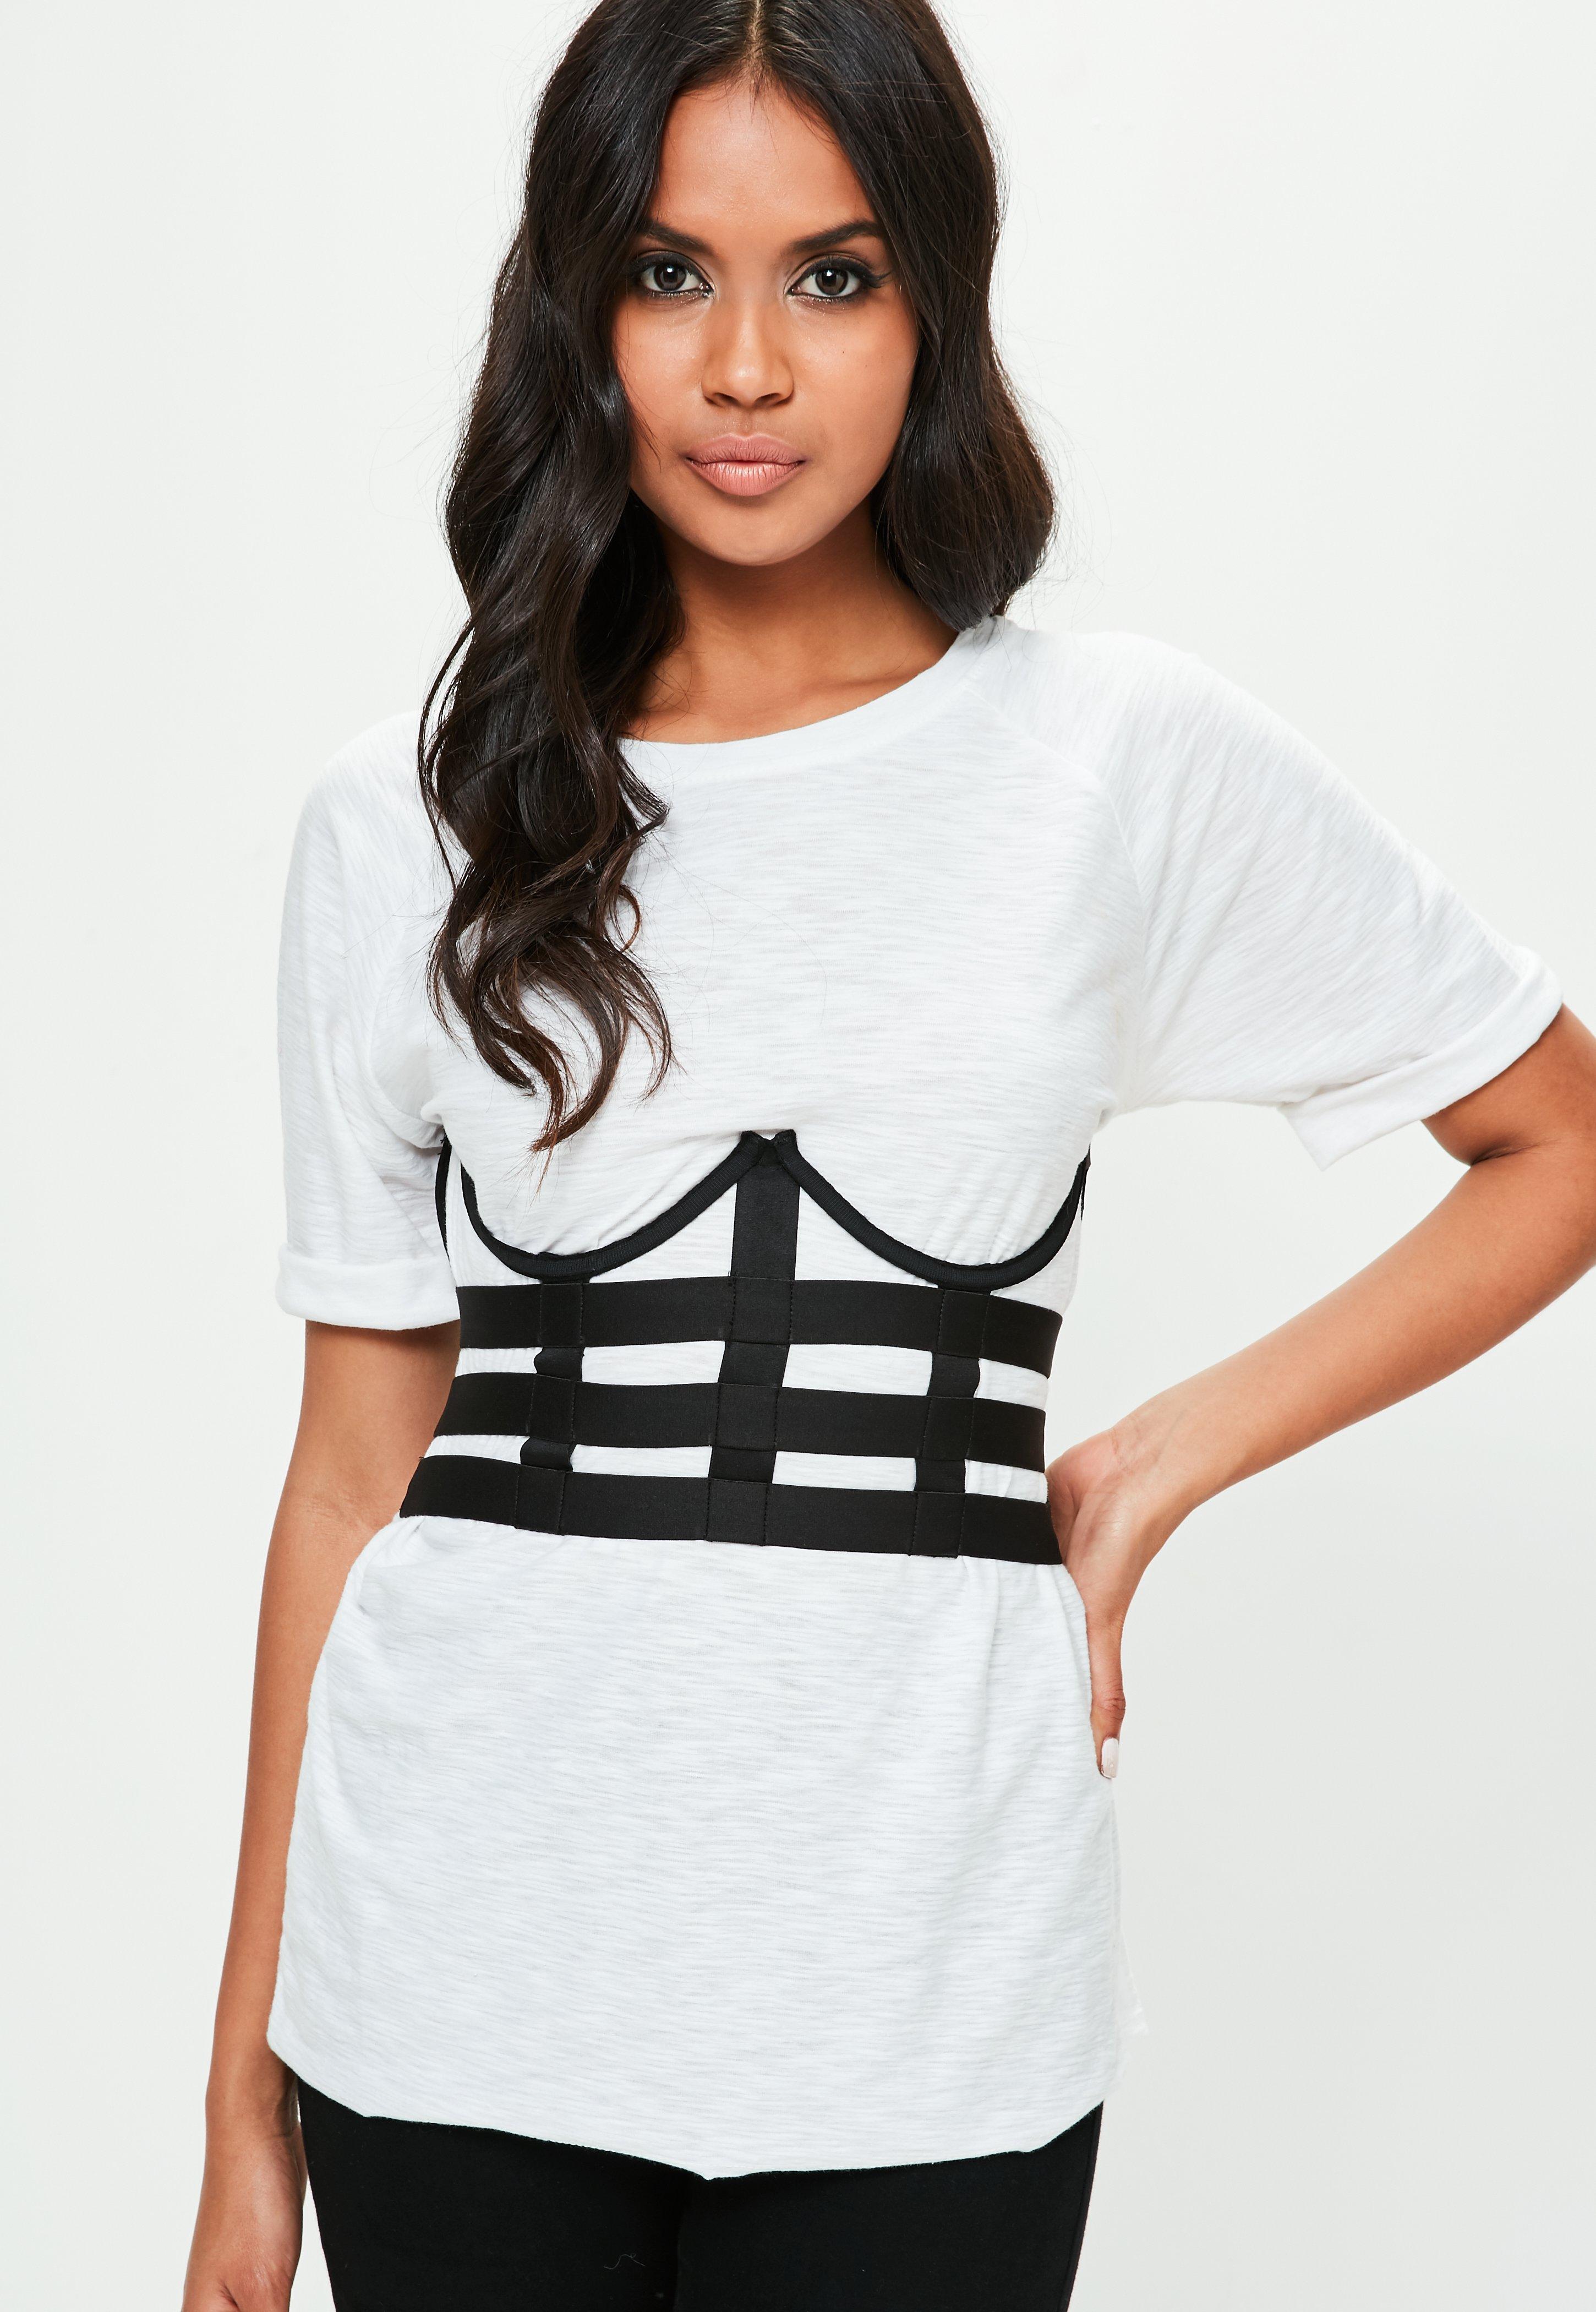 Belts for dresses uk cheap